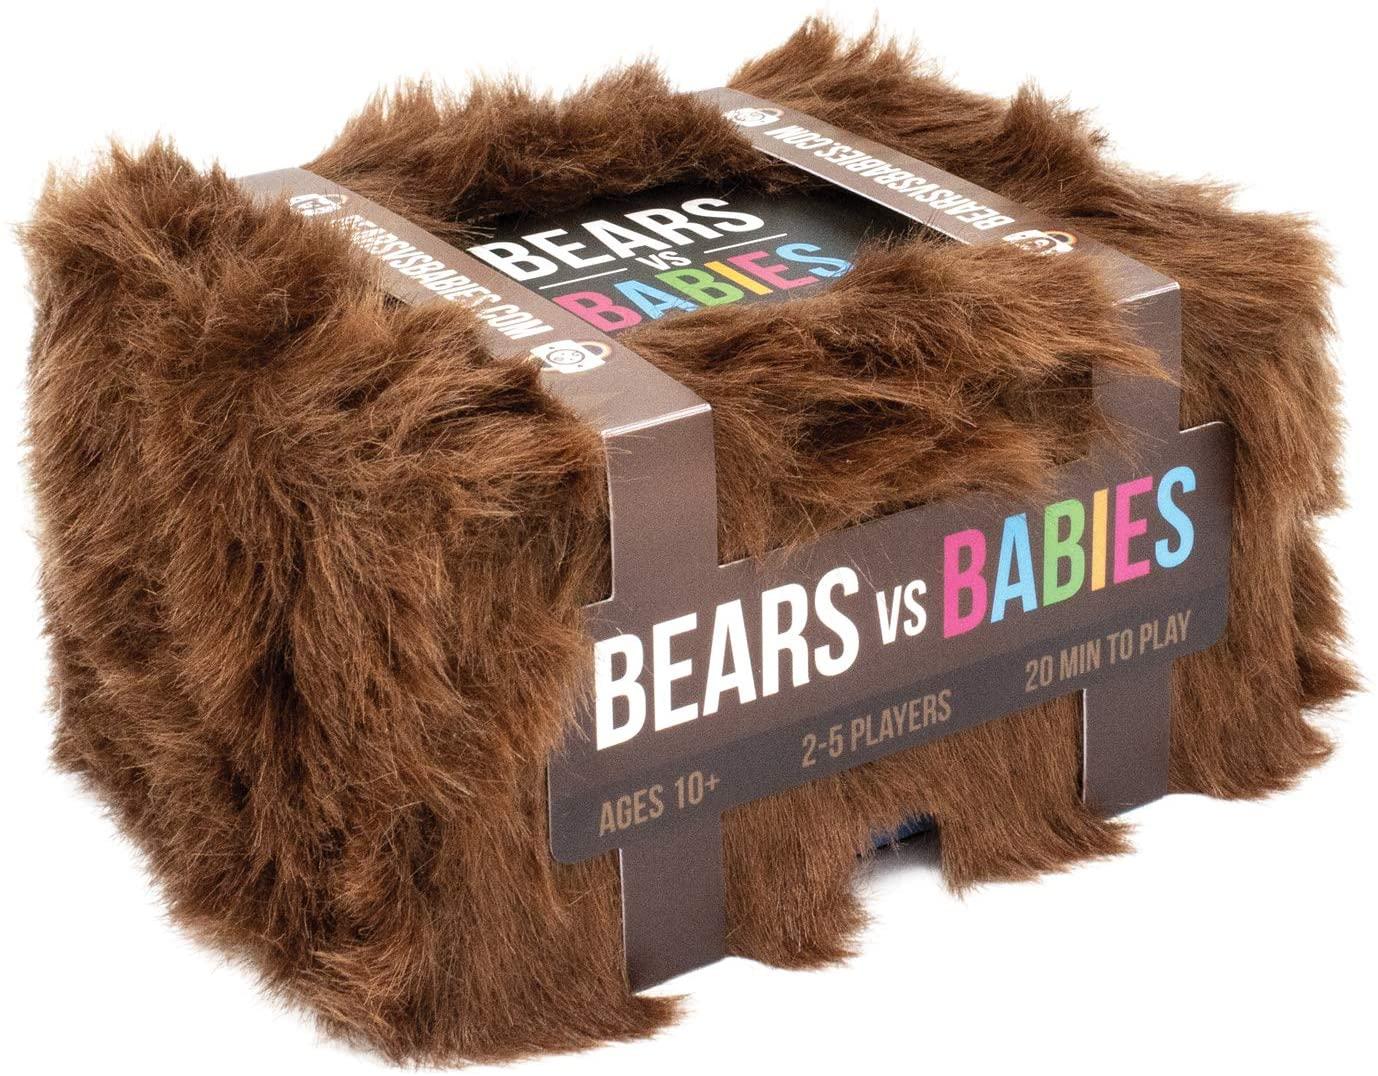 Bears vs Babies (Escape Room Goderich) Image